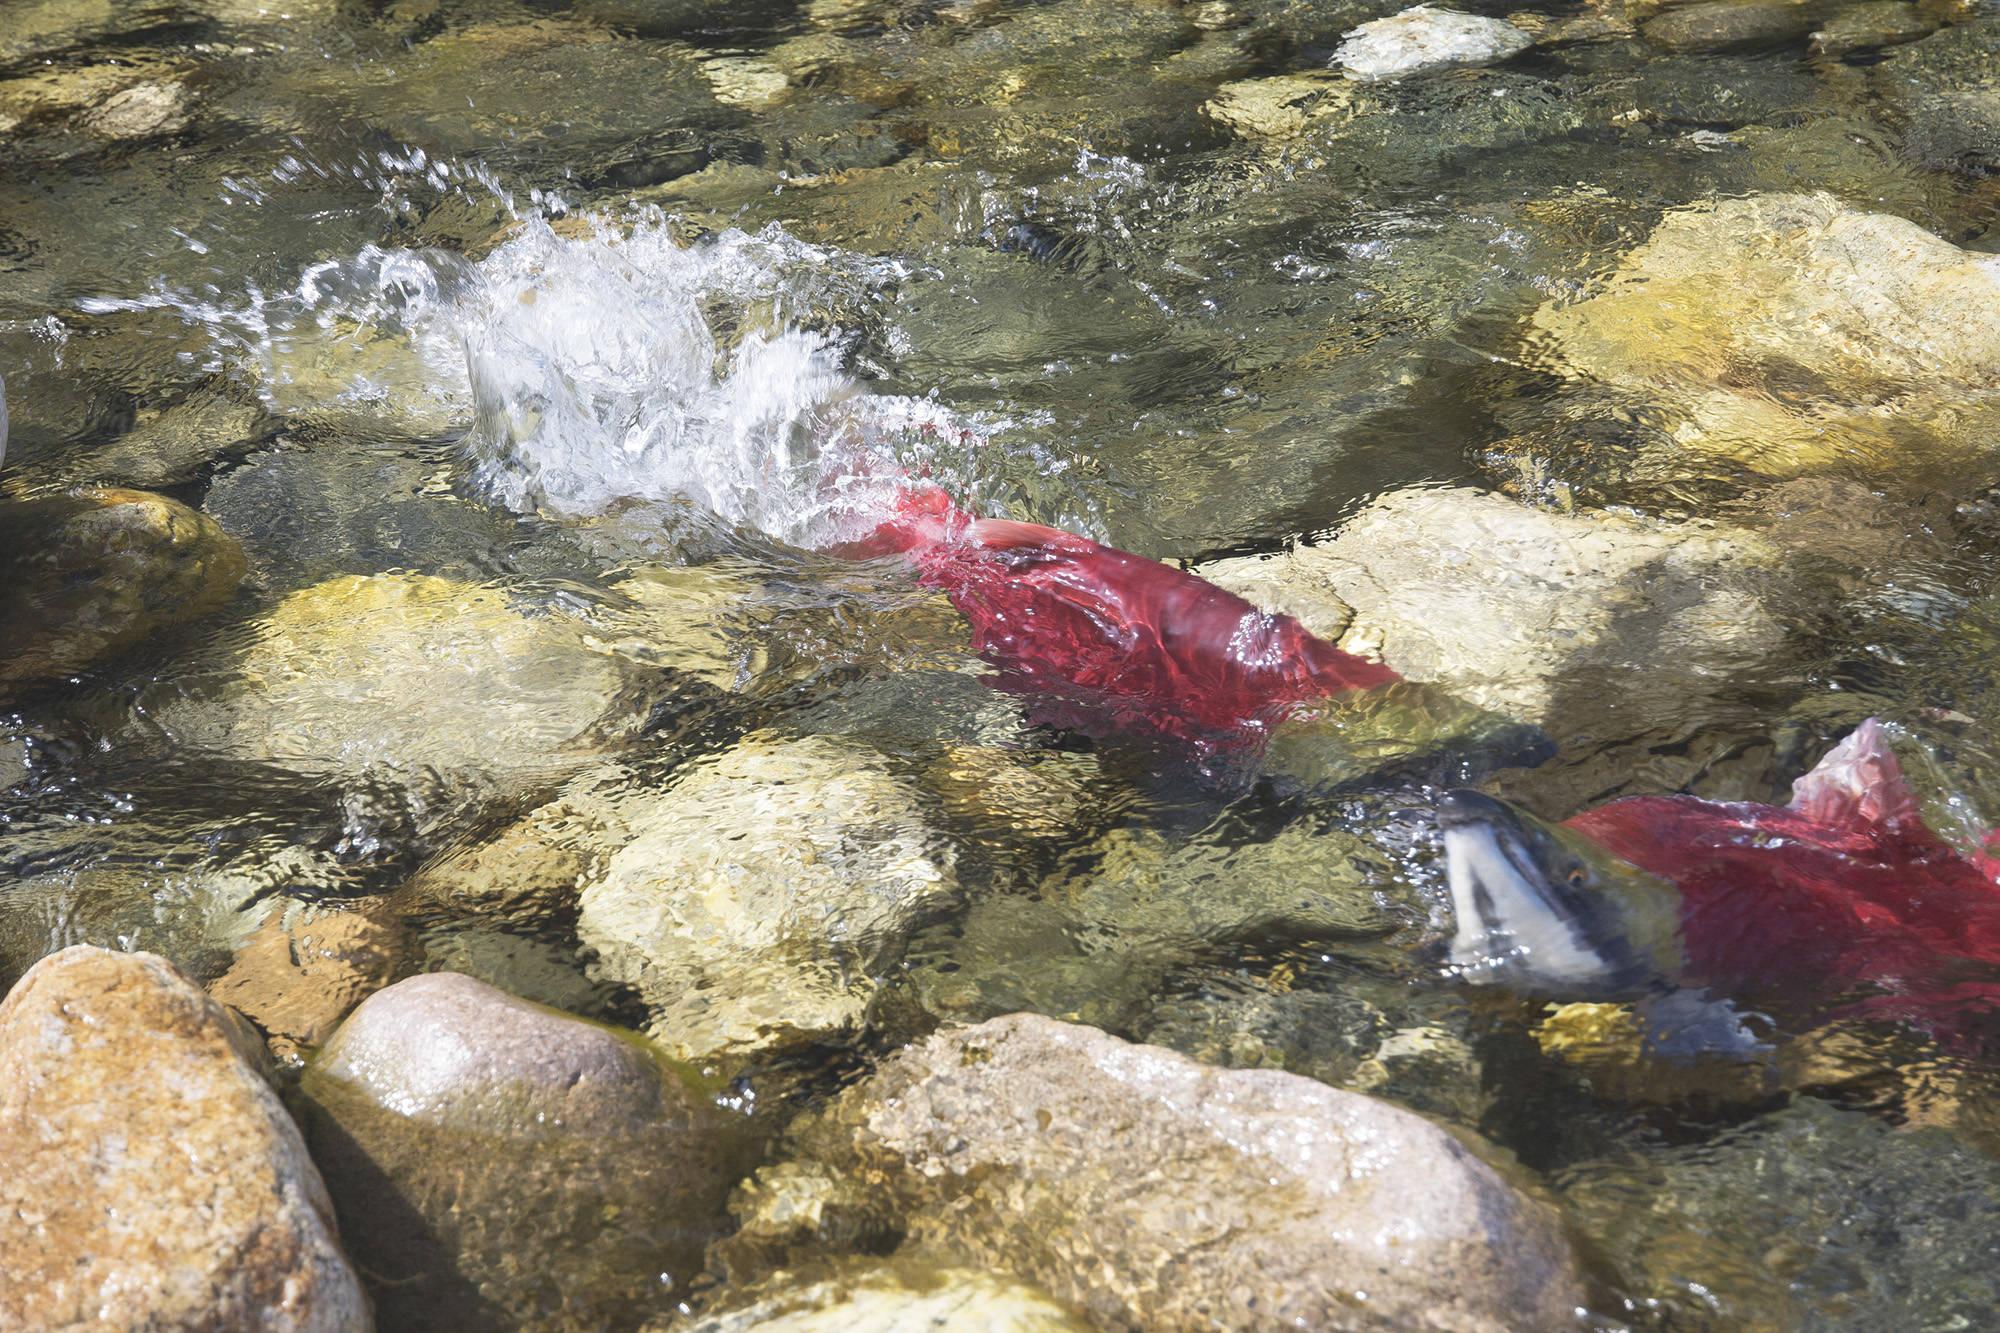 Video: B.C. sockeye salmon run creates a beautiful spectacle